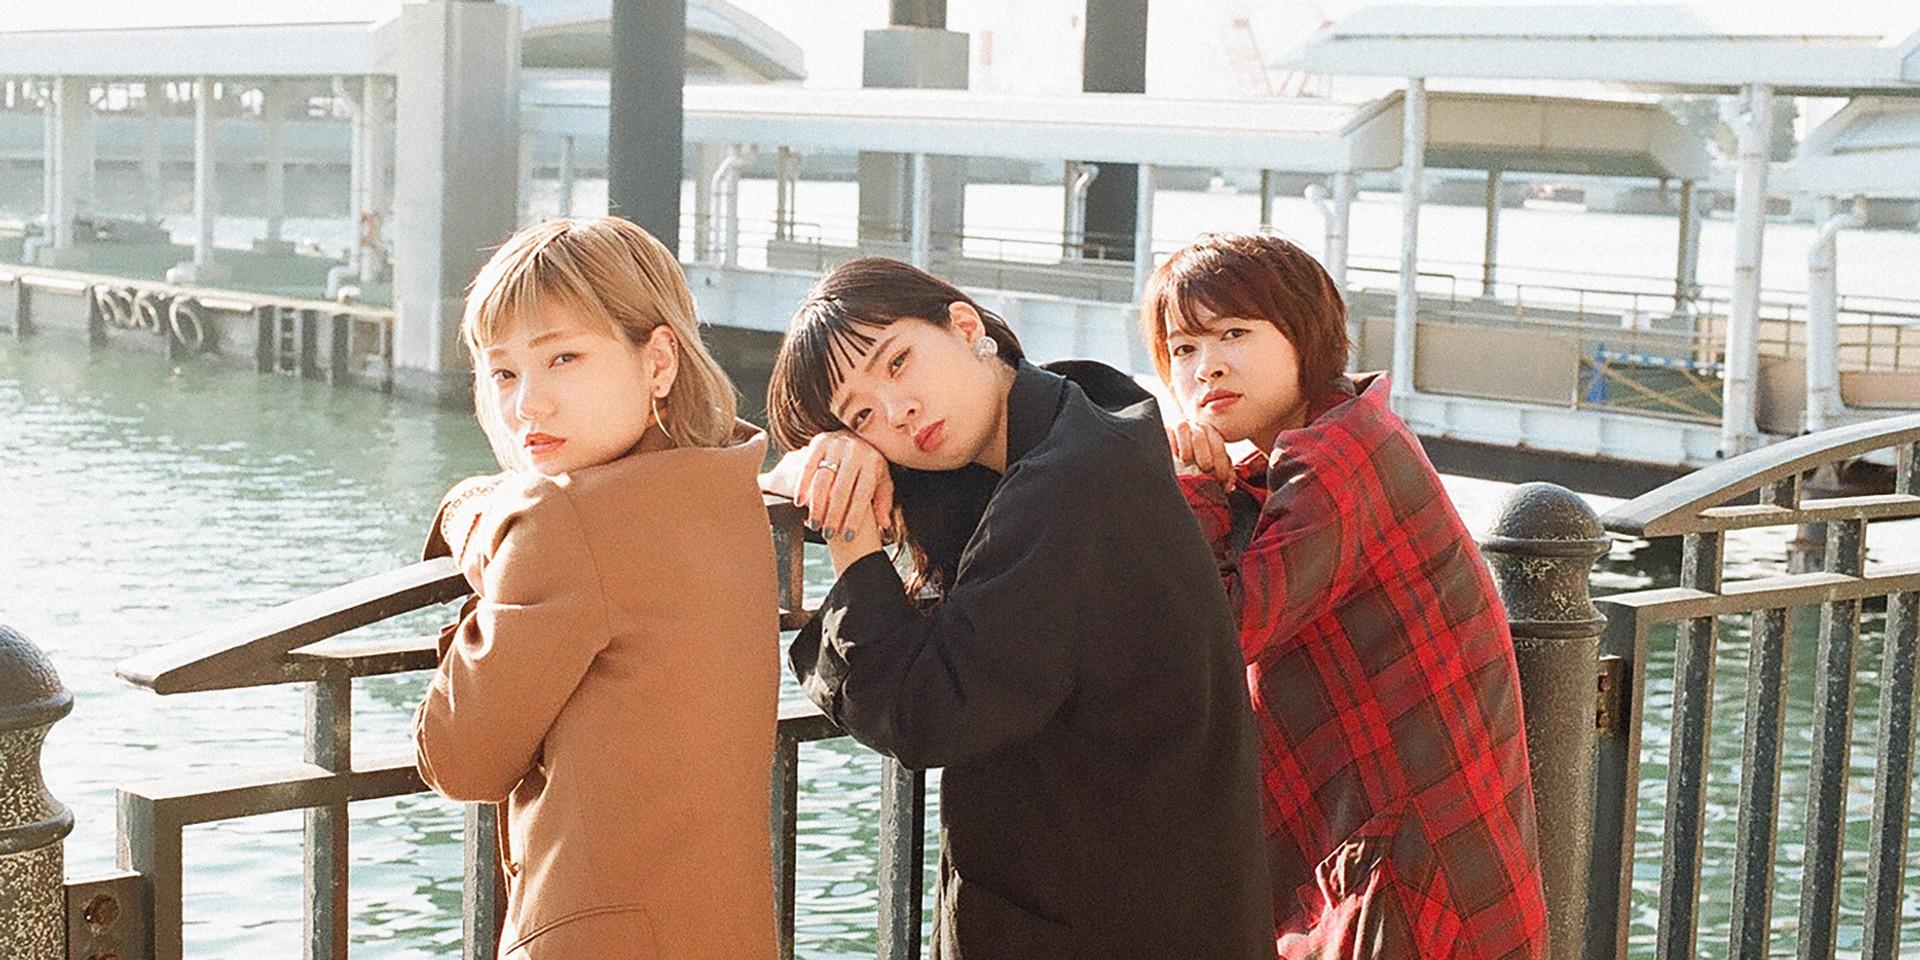 Asia Spotlight: Growing up but never apart, J-rock band SHISHAMO share their nostalgia-filled musical journey